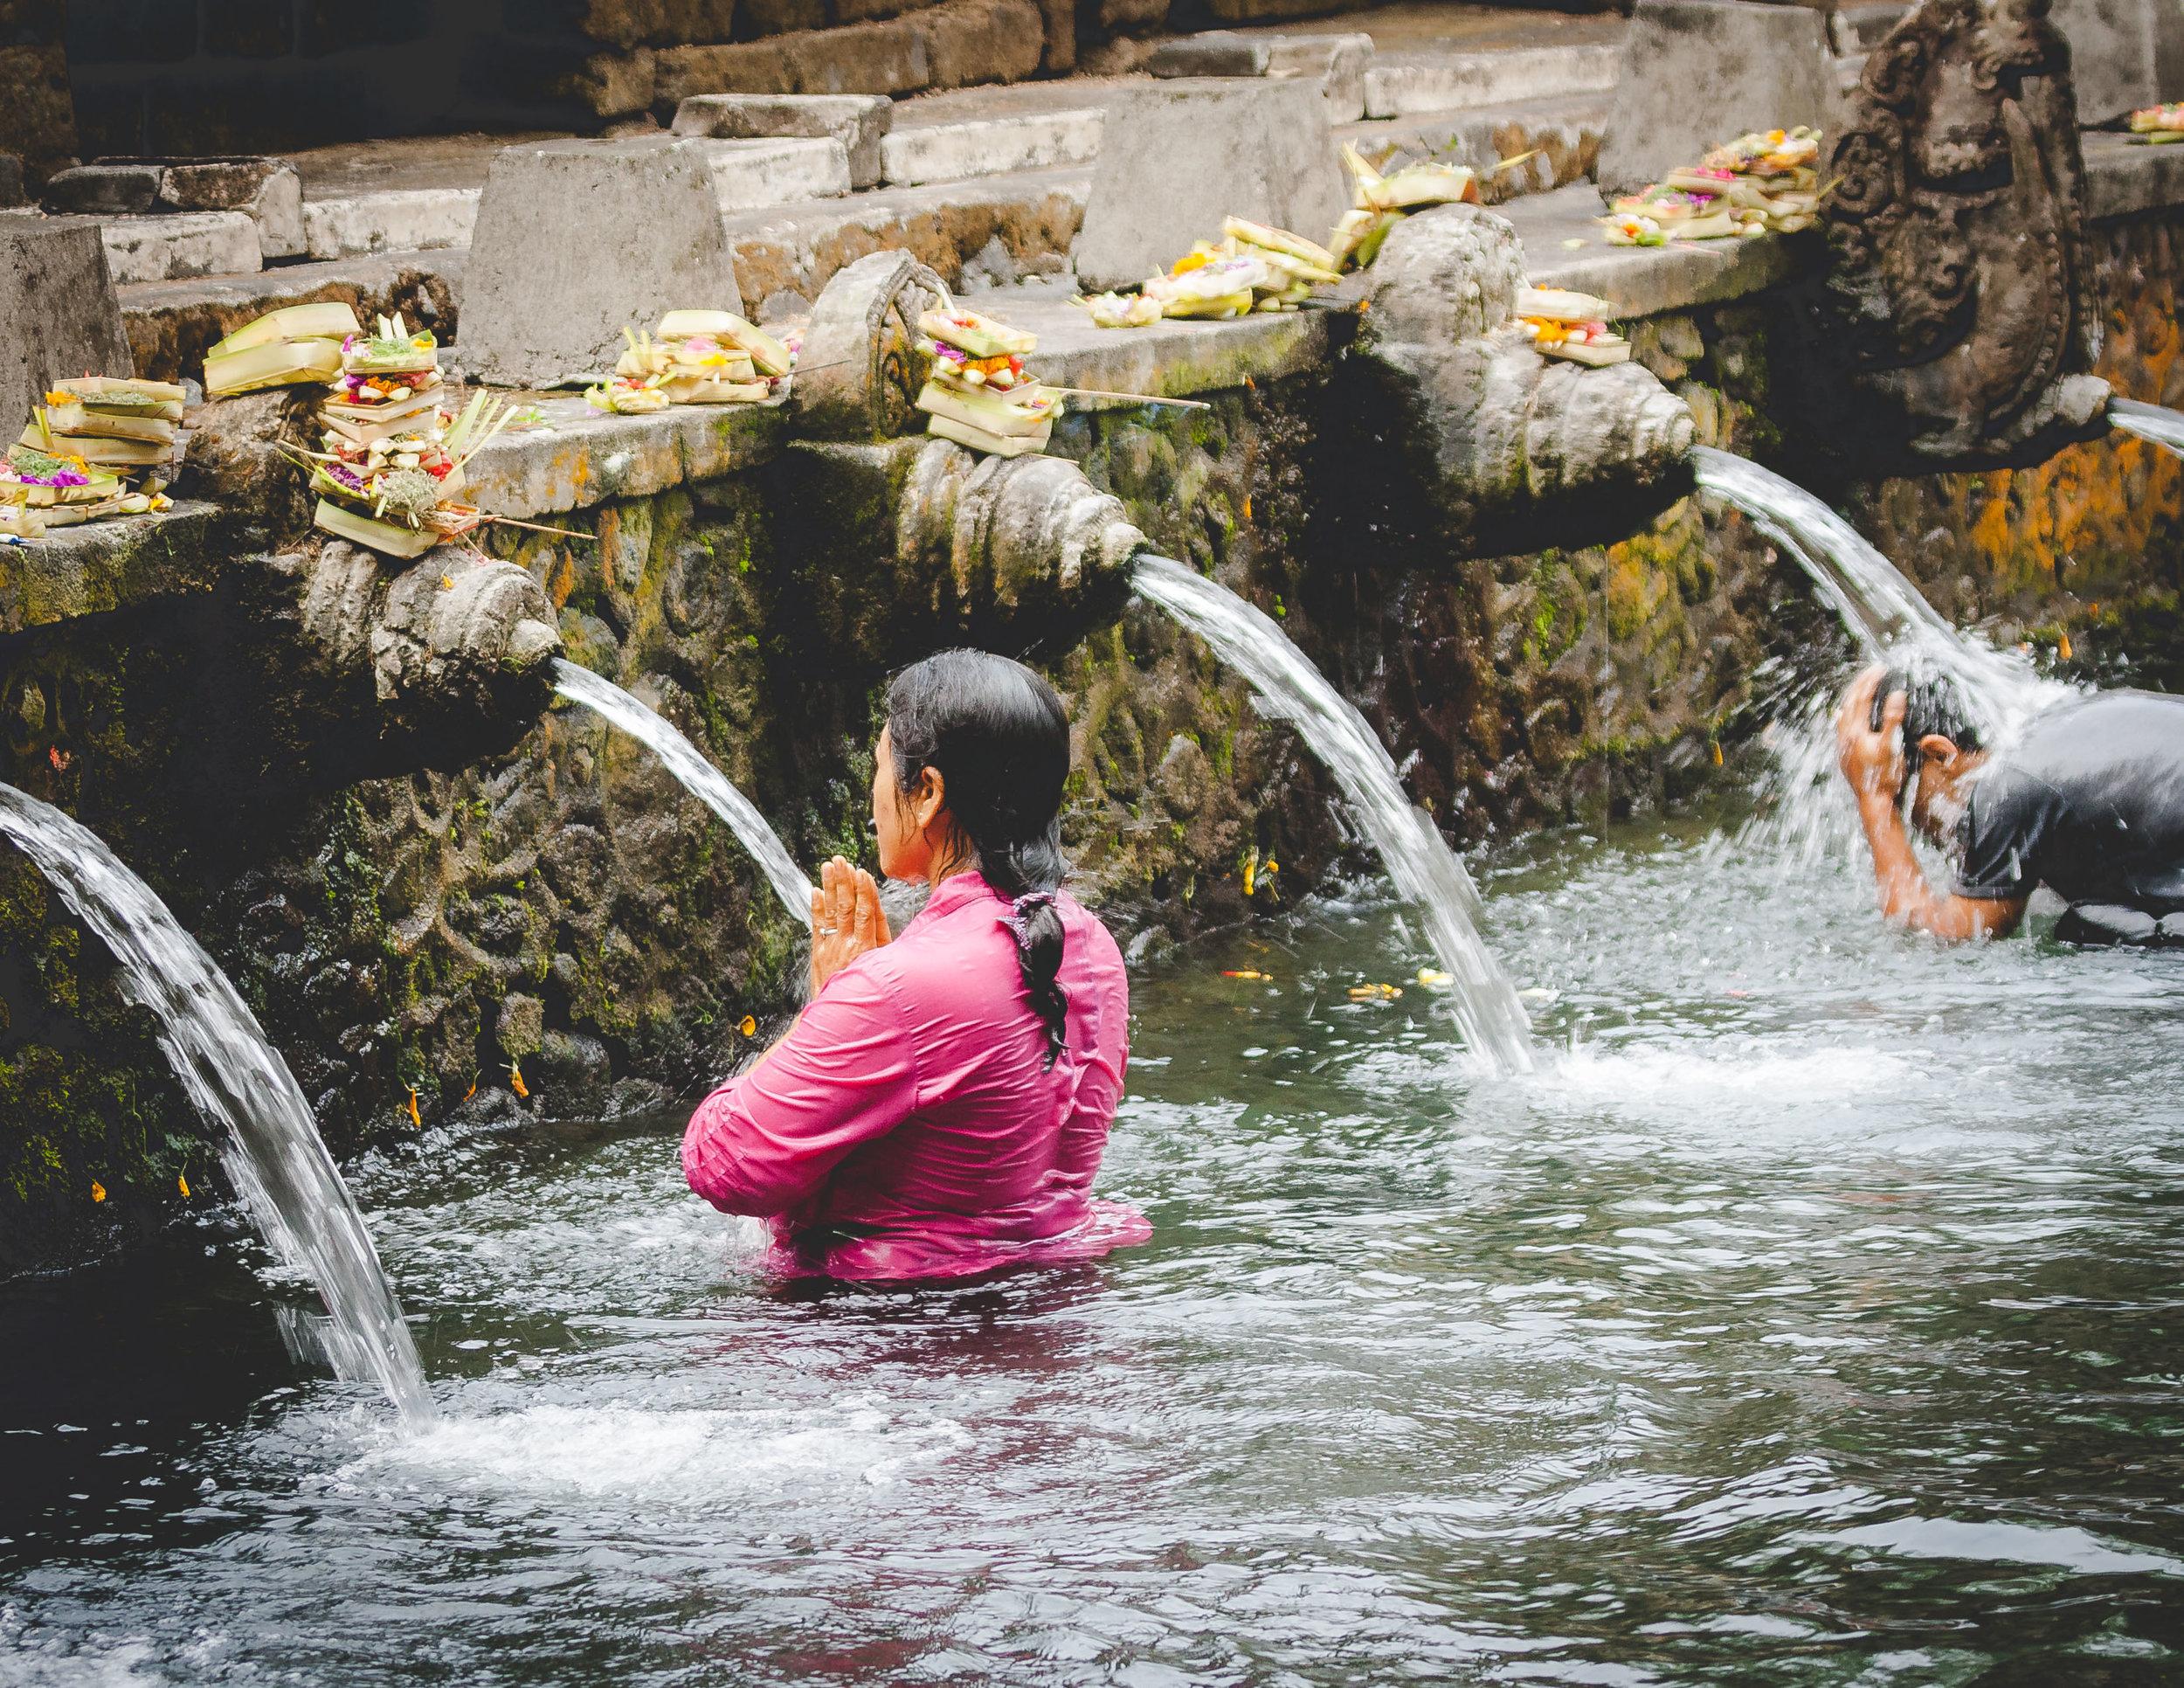 Bali Itinerary 7 days: Pura Tirta Empul